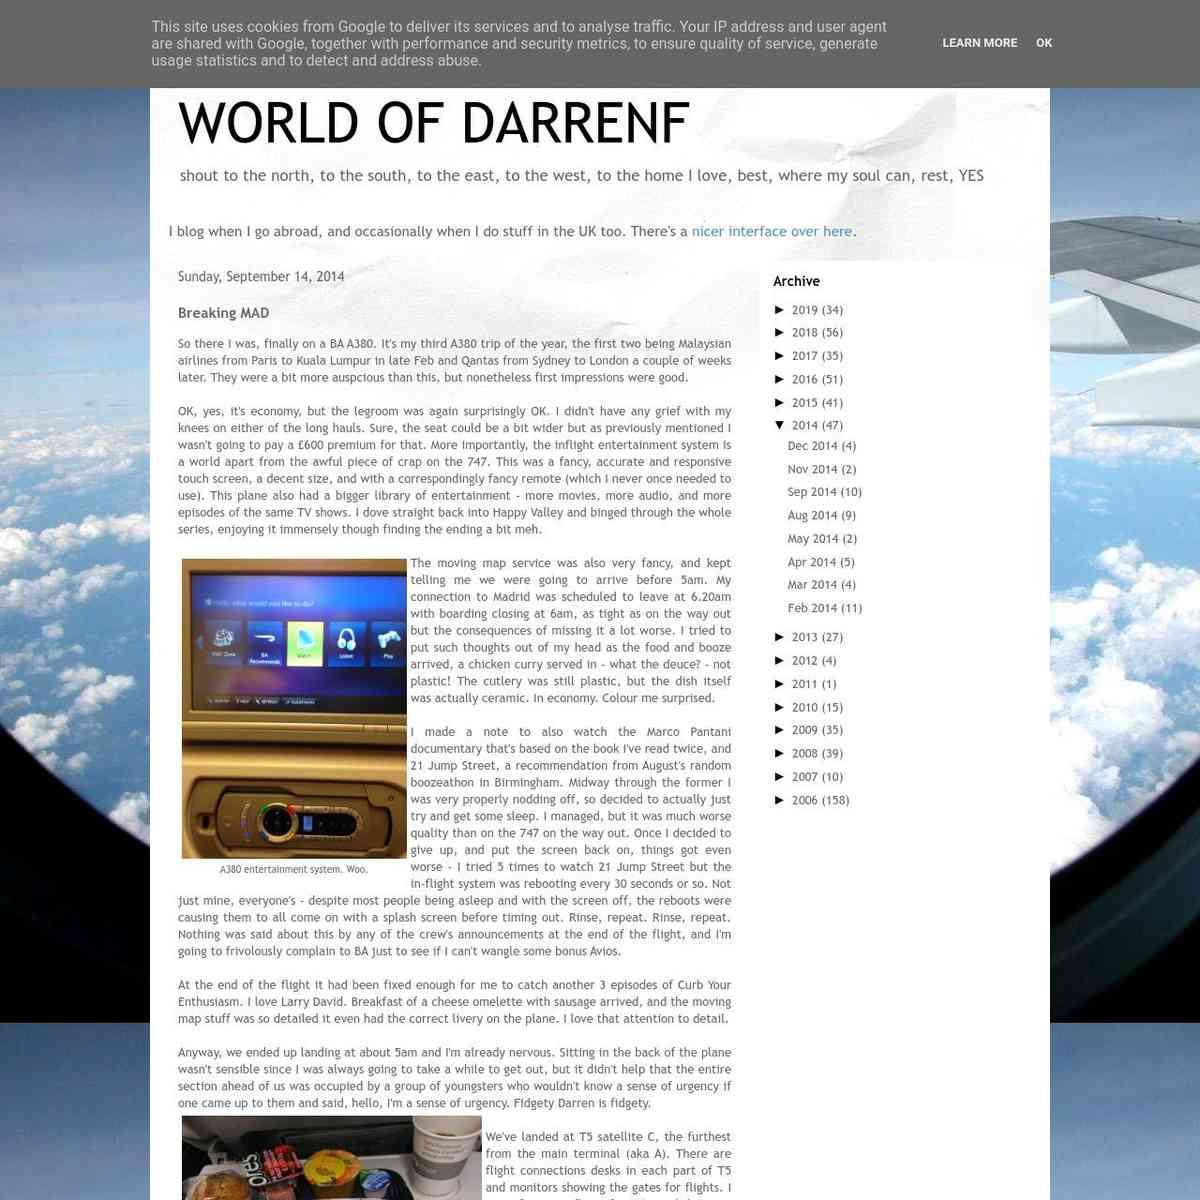 blog.darrenf.org/2014/09/breaking-mad.html